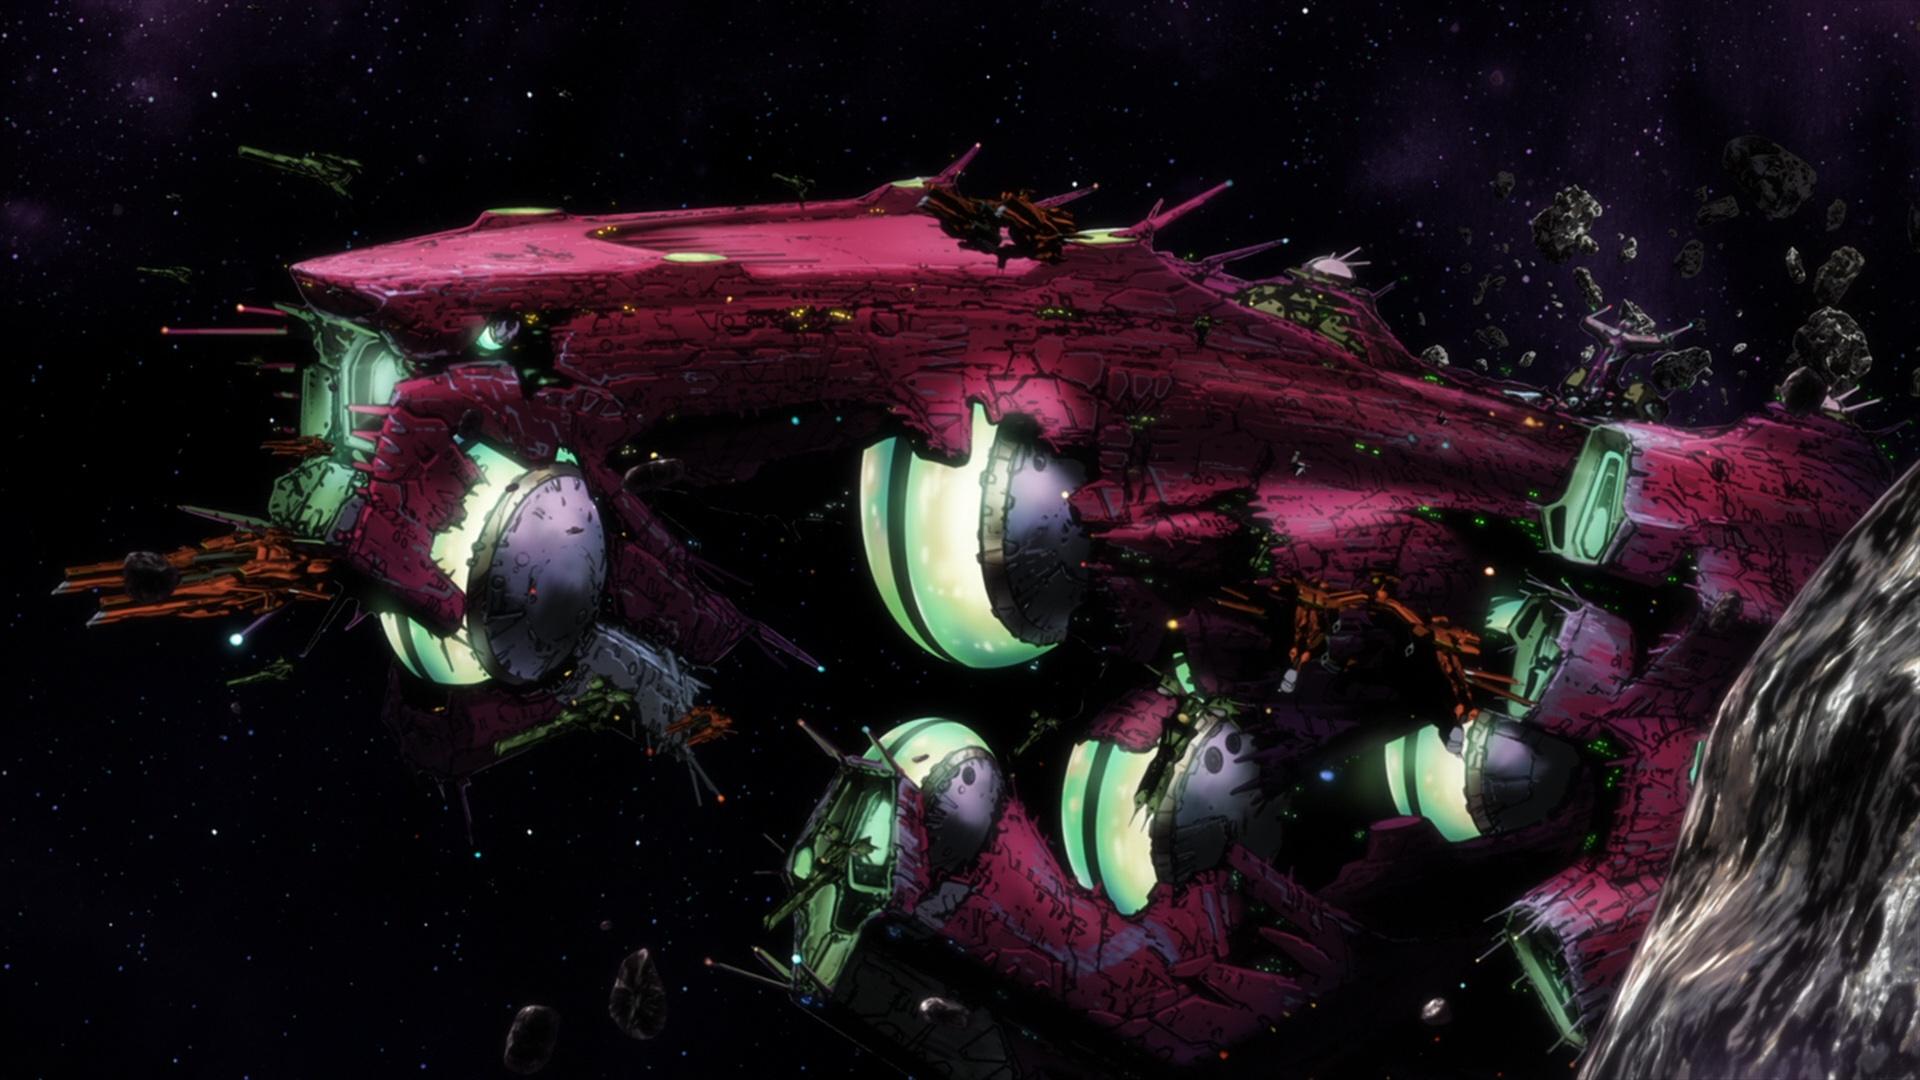 macross-galaxy.jpg